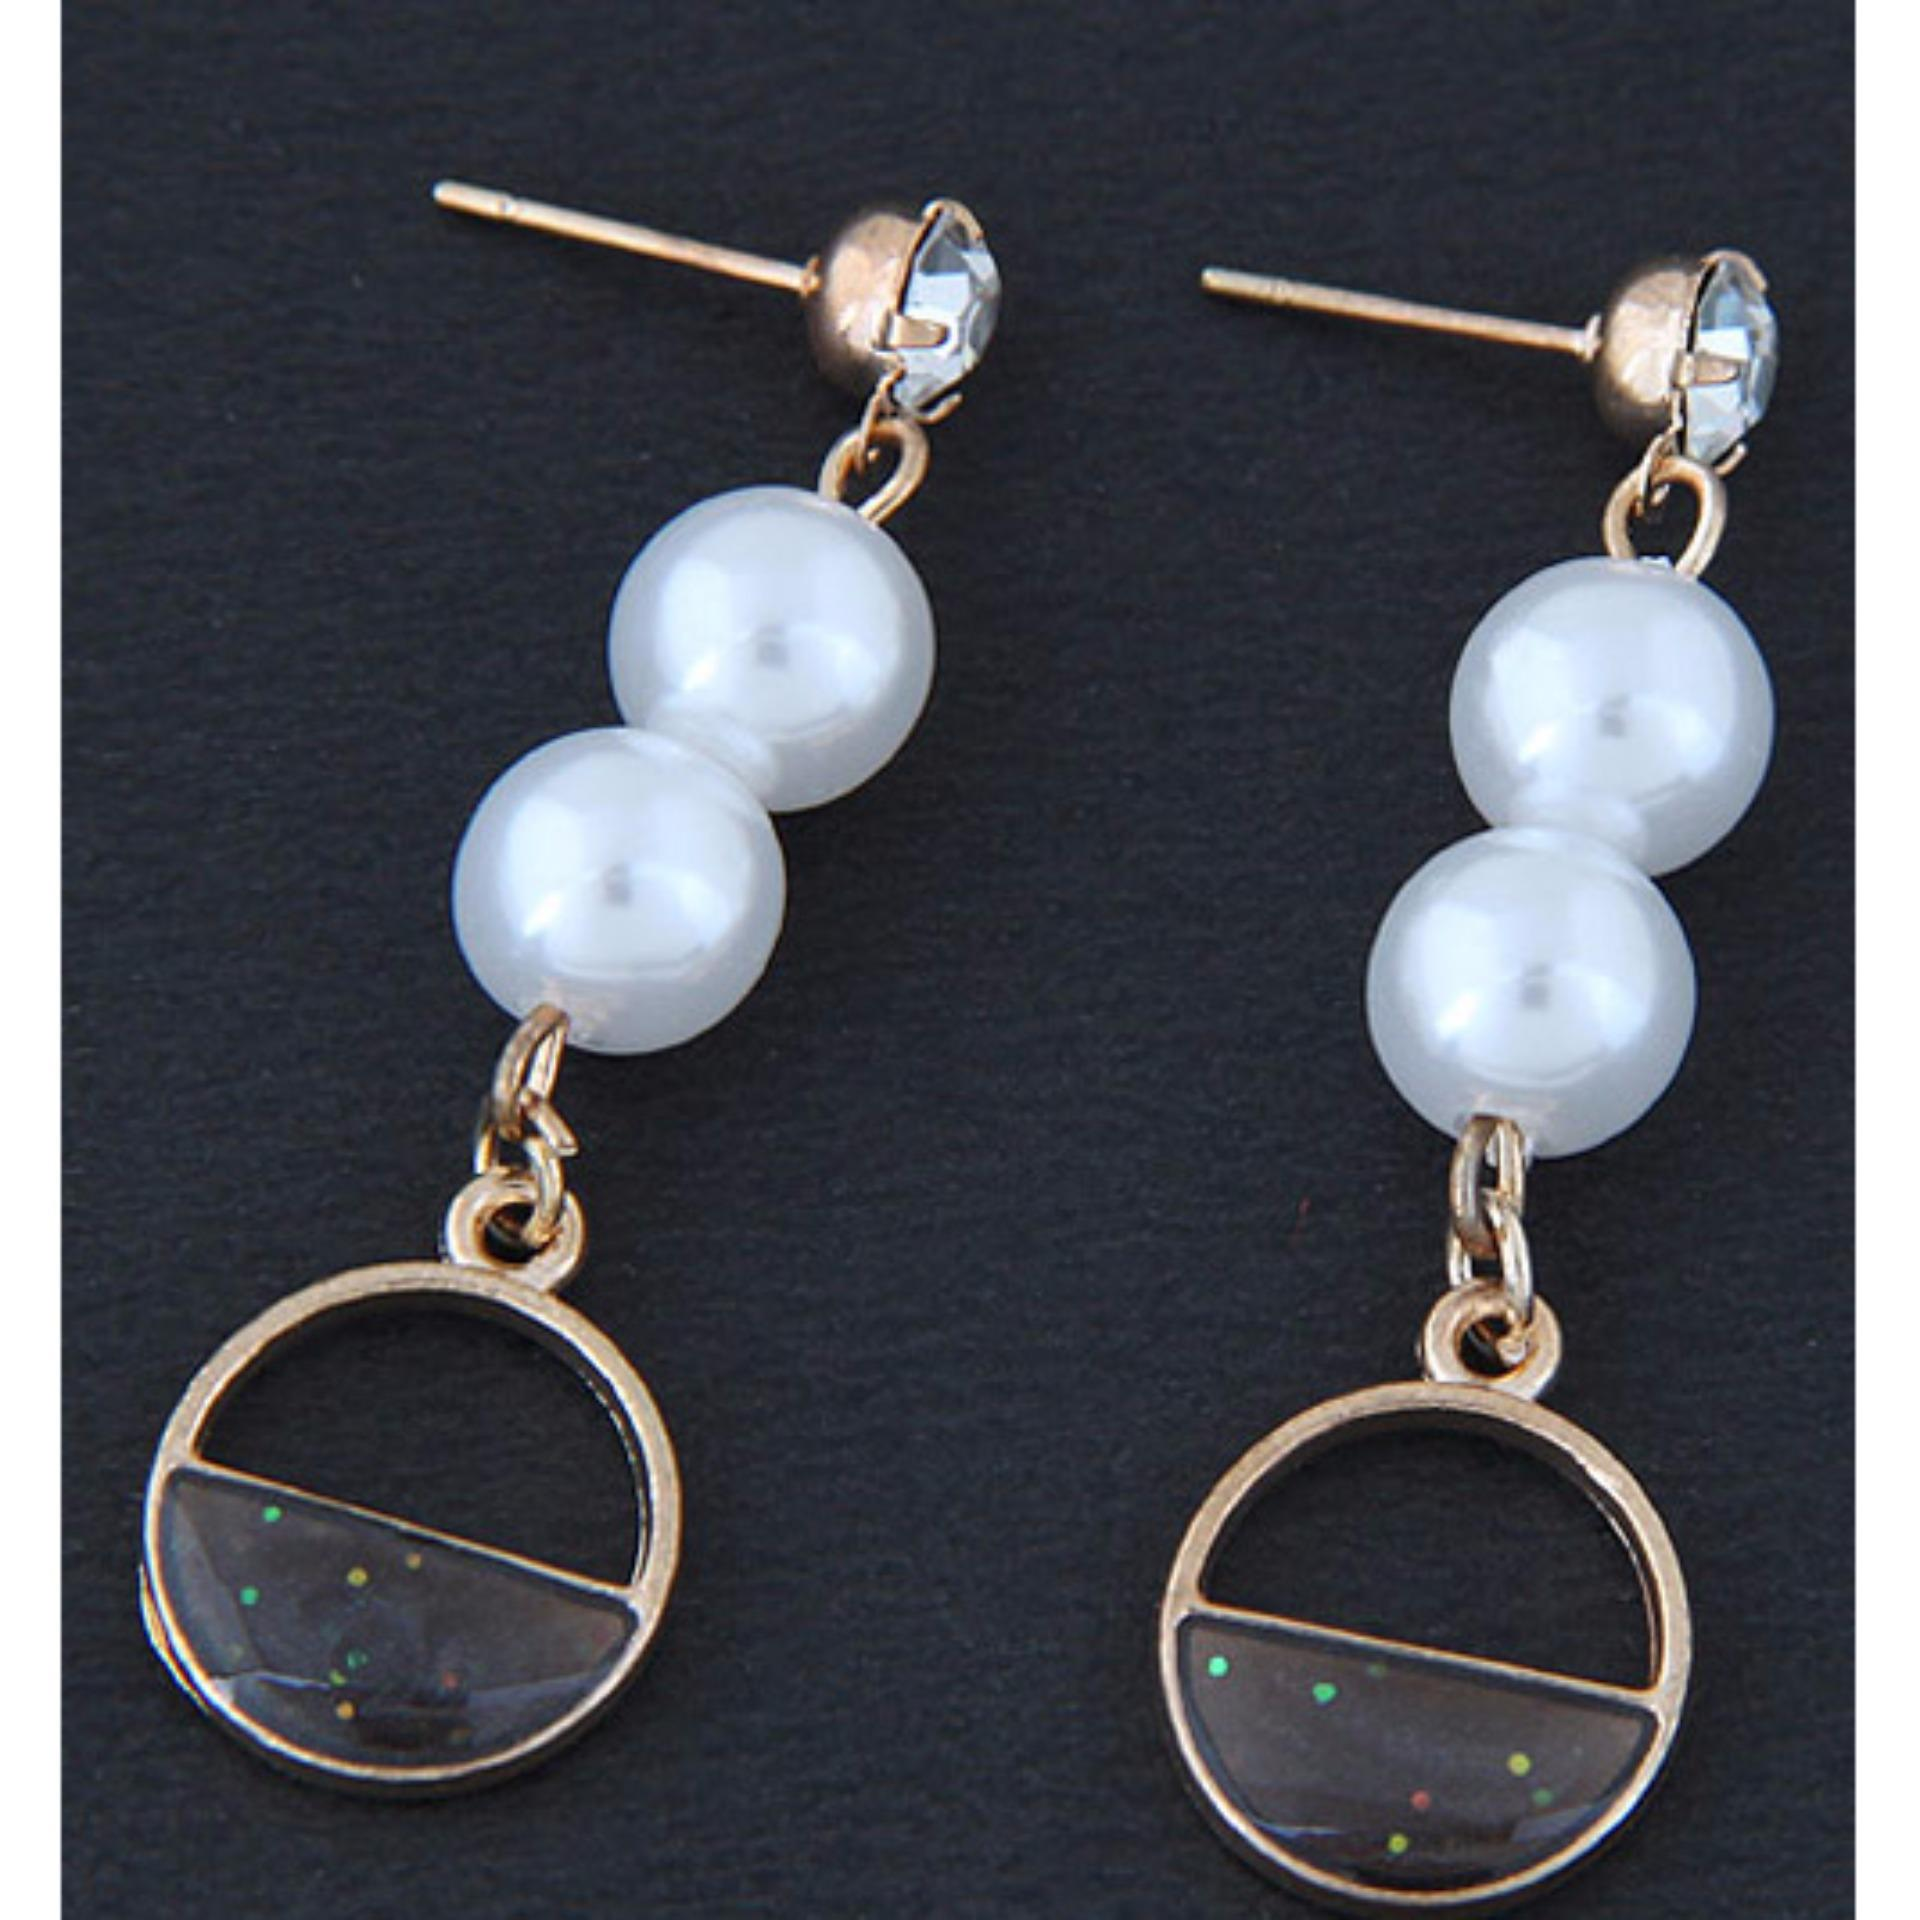 LRC Anting Tusuk Fashion Diamond&pearl Decorated Earrings